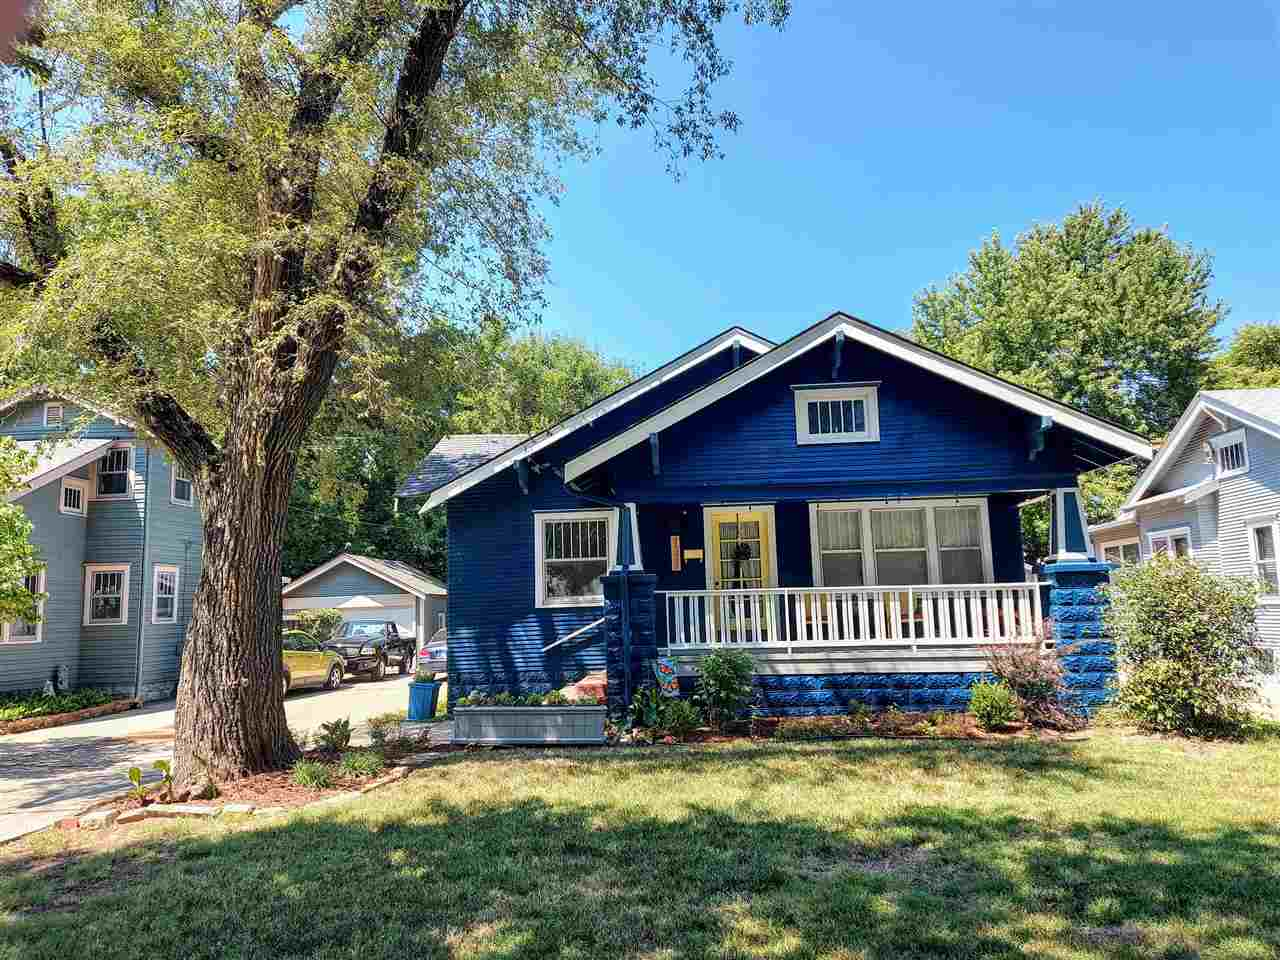 Adorable Riverside Bungalow with new exterior paint, new front porch, new back deck, gorgeous landsc